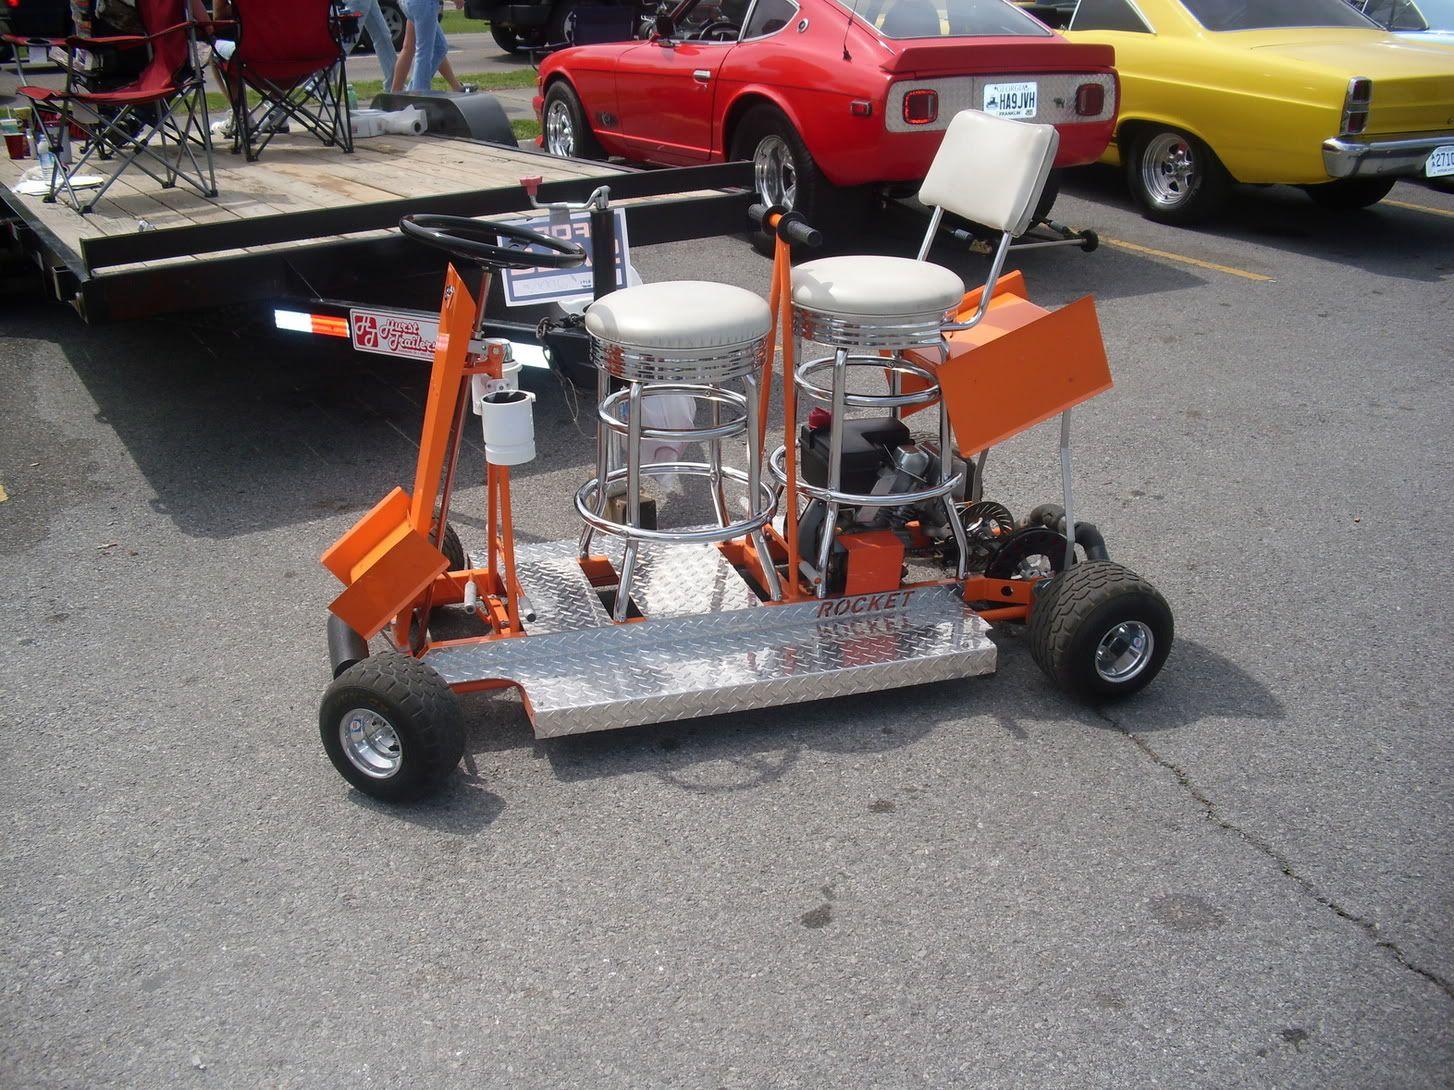 Project 212cc Giant Rc Car Go Kart T Maquinas